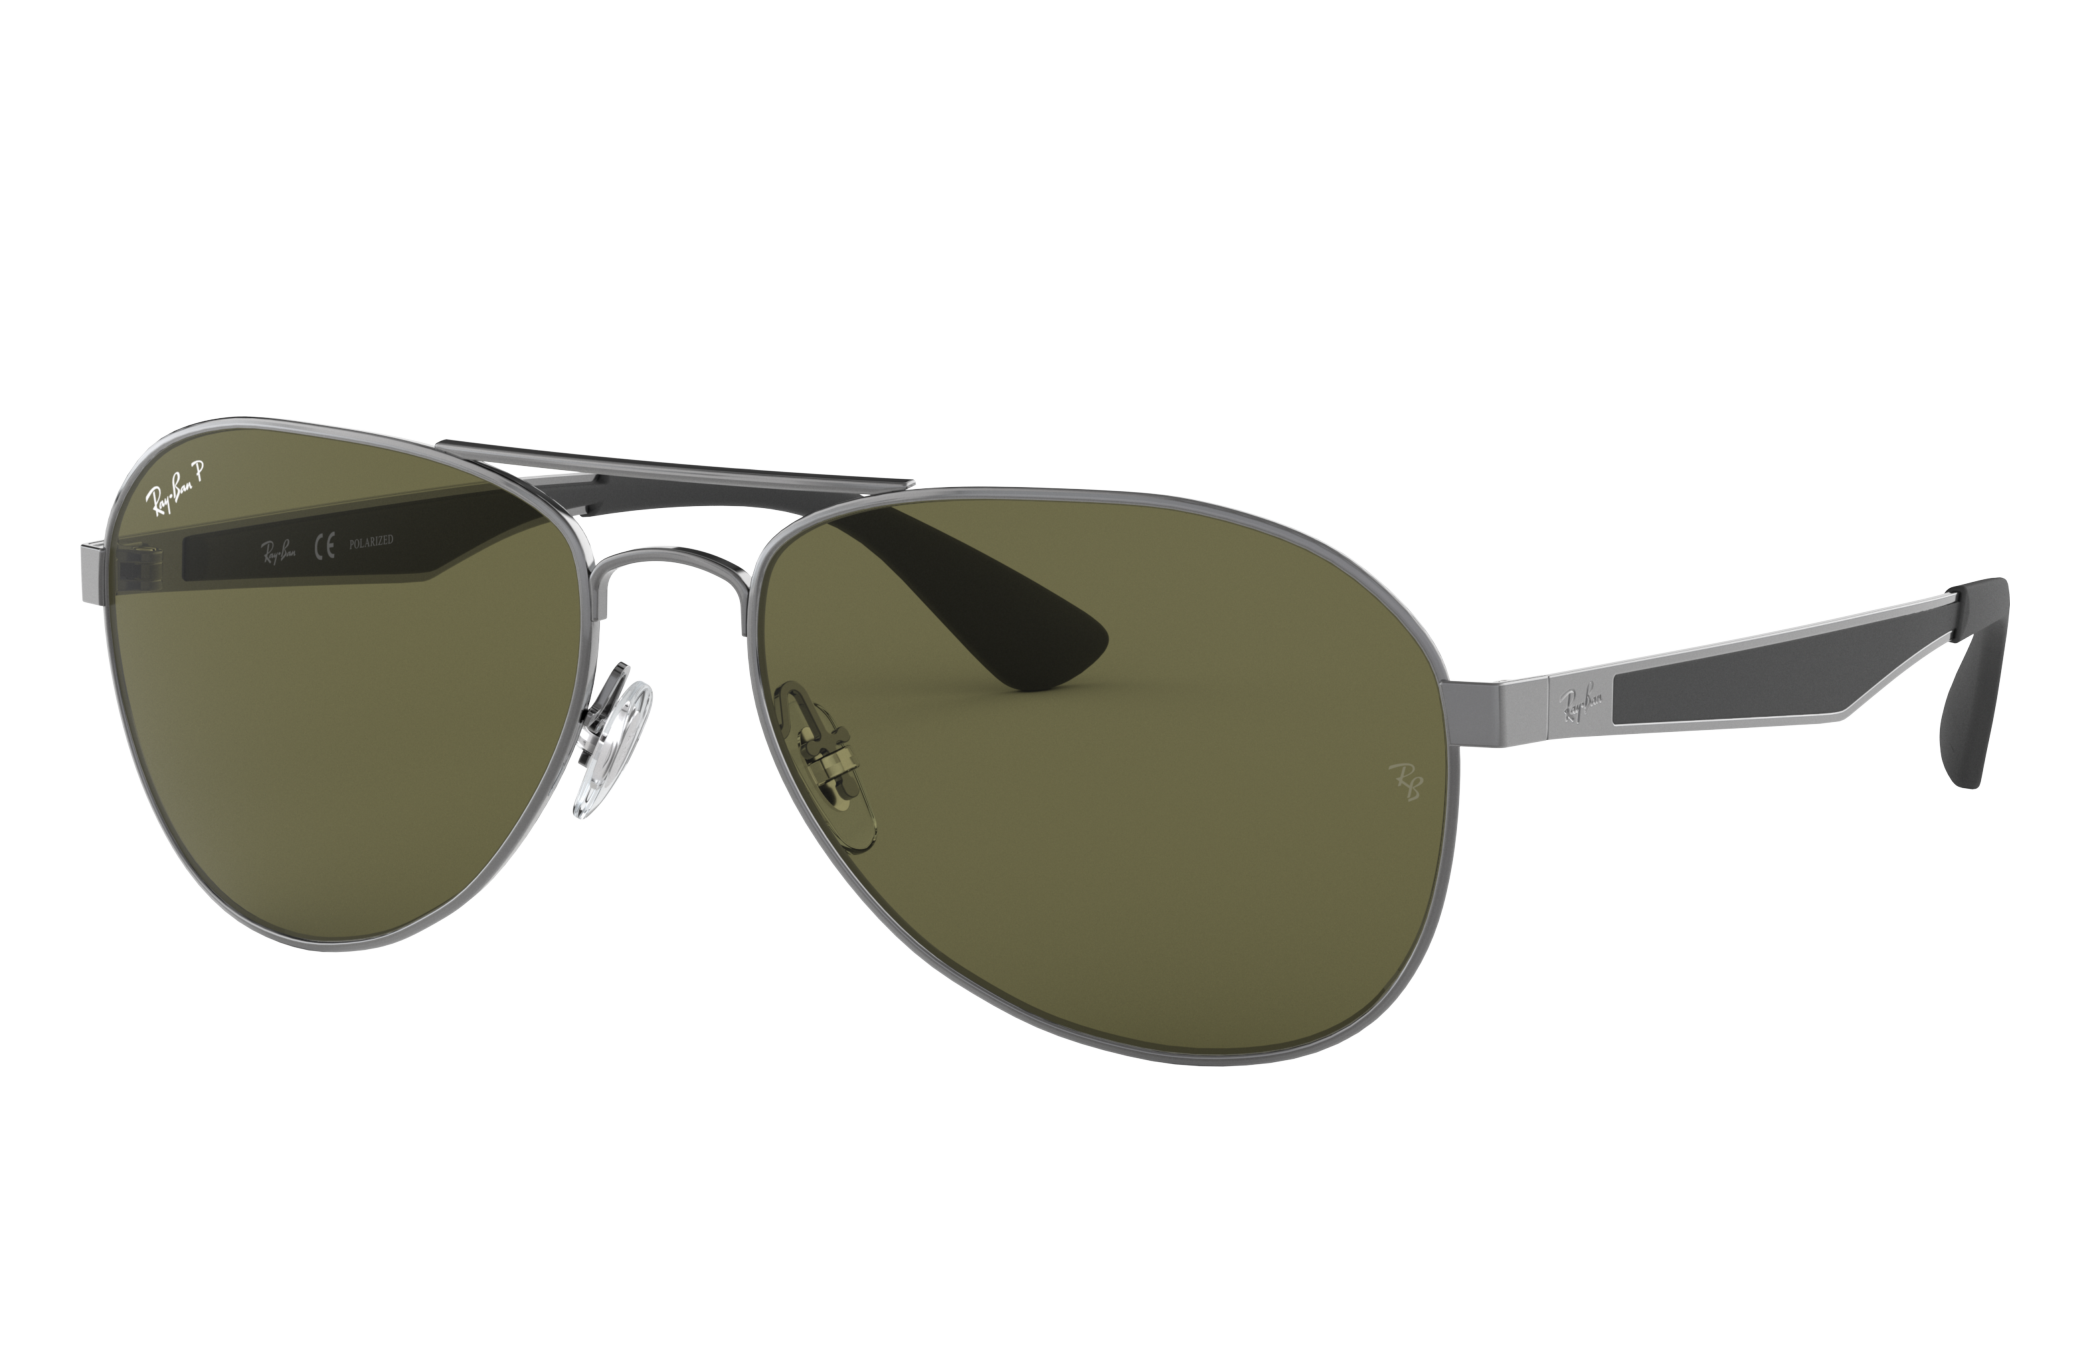 Ray-Ban Rb3549 Gunmetal, Polarized Green Lenses - RB3549